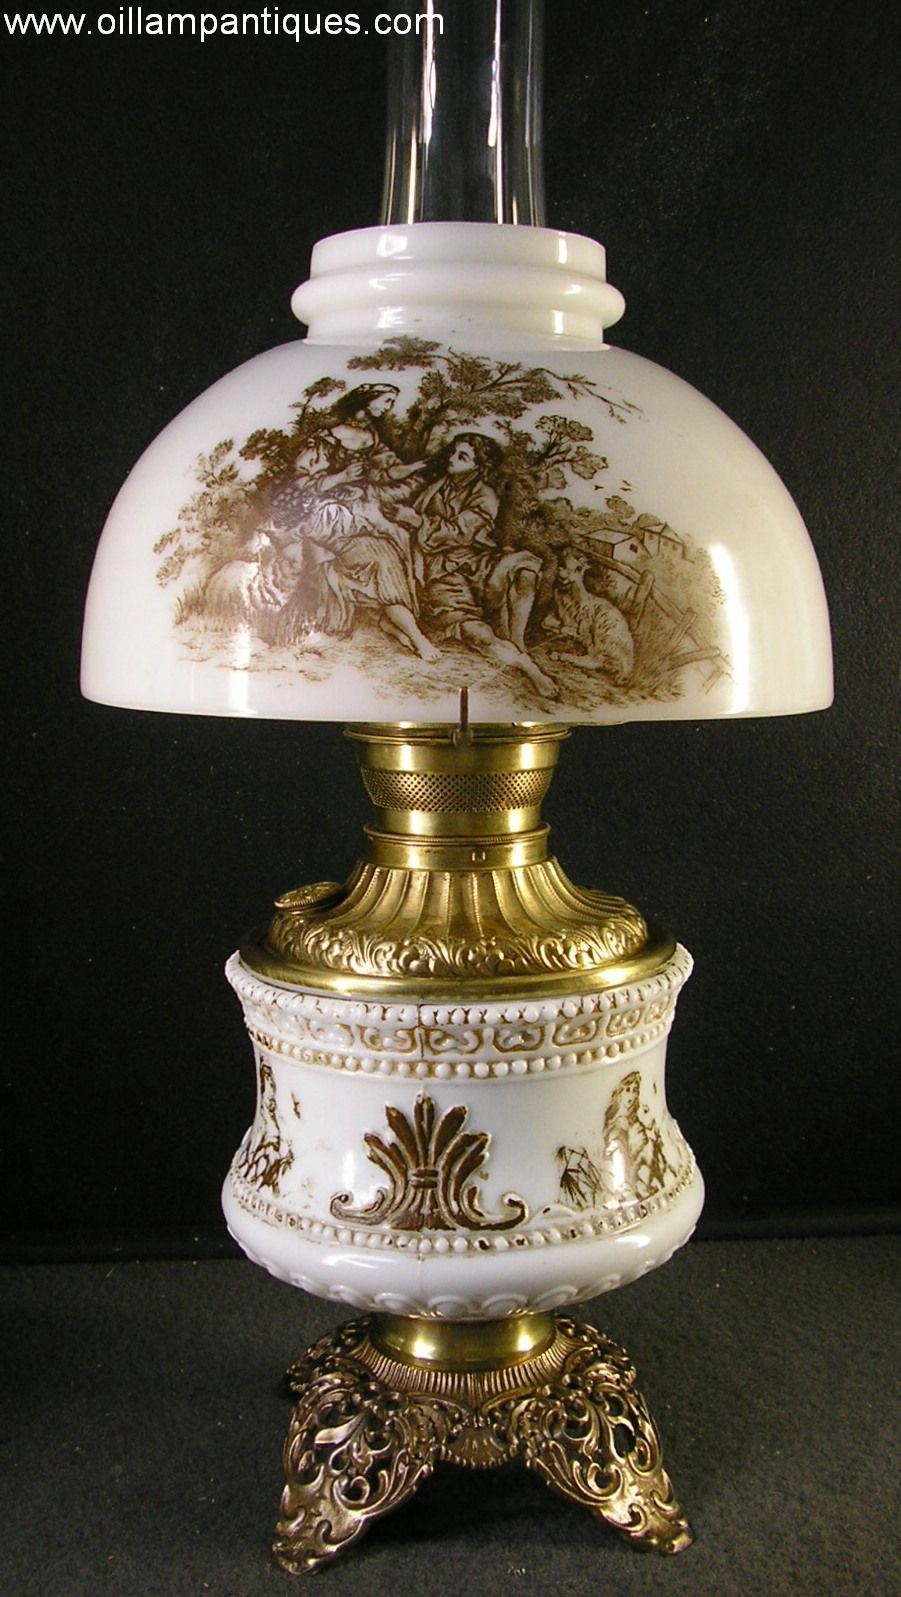 Regent antiques lights antique victorian oil lamp c 1860 - Victorian Lighting Antique Half Shade Parlour Oil Lamp Kerosene Lamp With Monochrome Stencil Decoration Oil Lamp Antiques